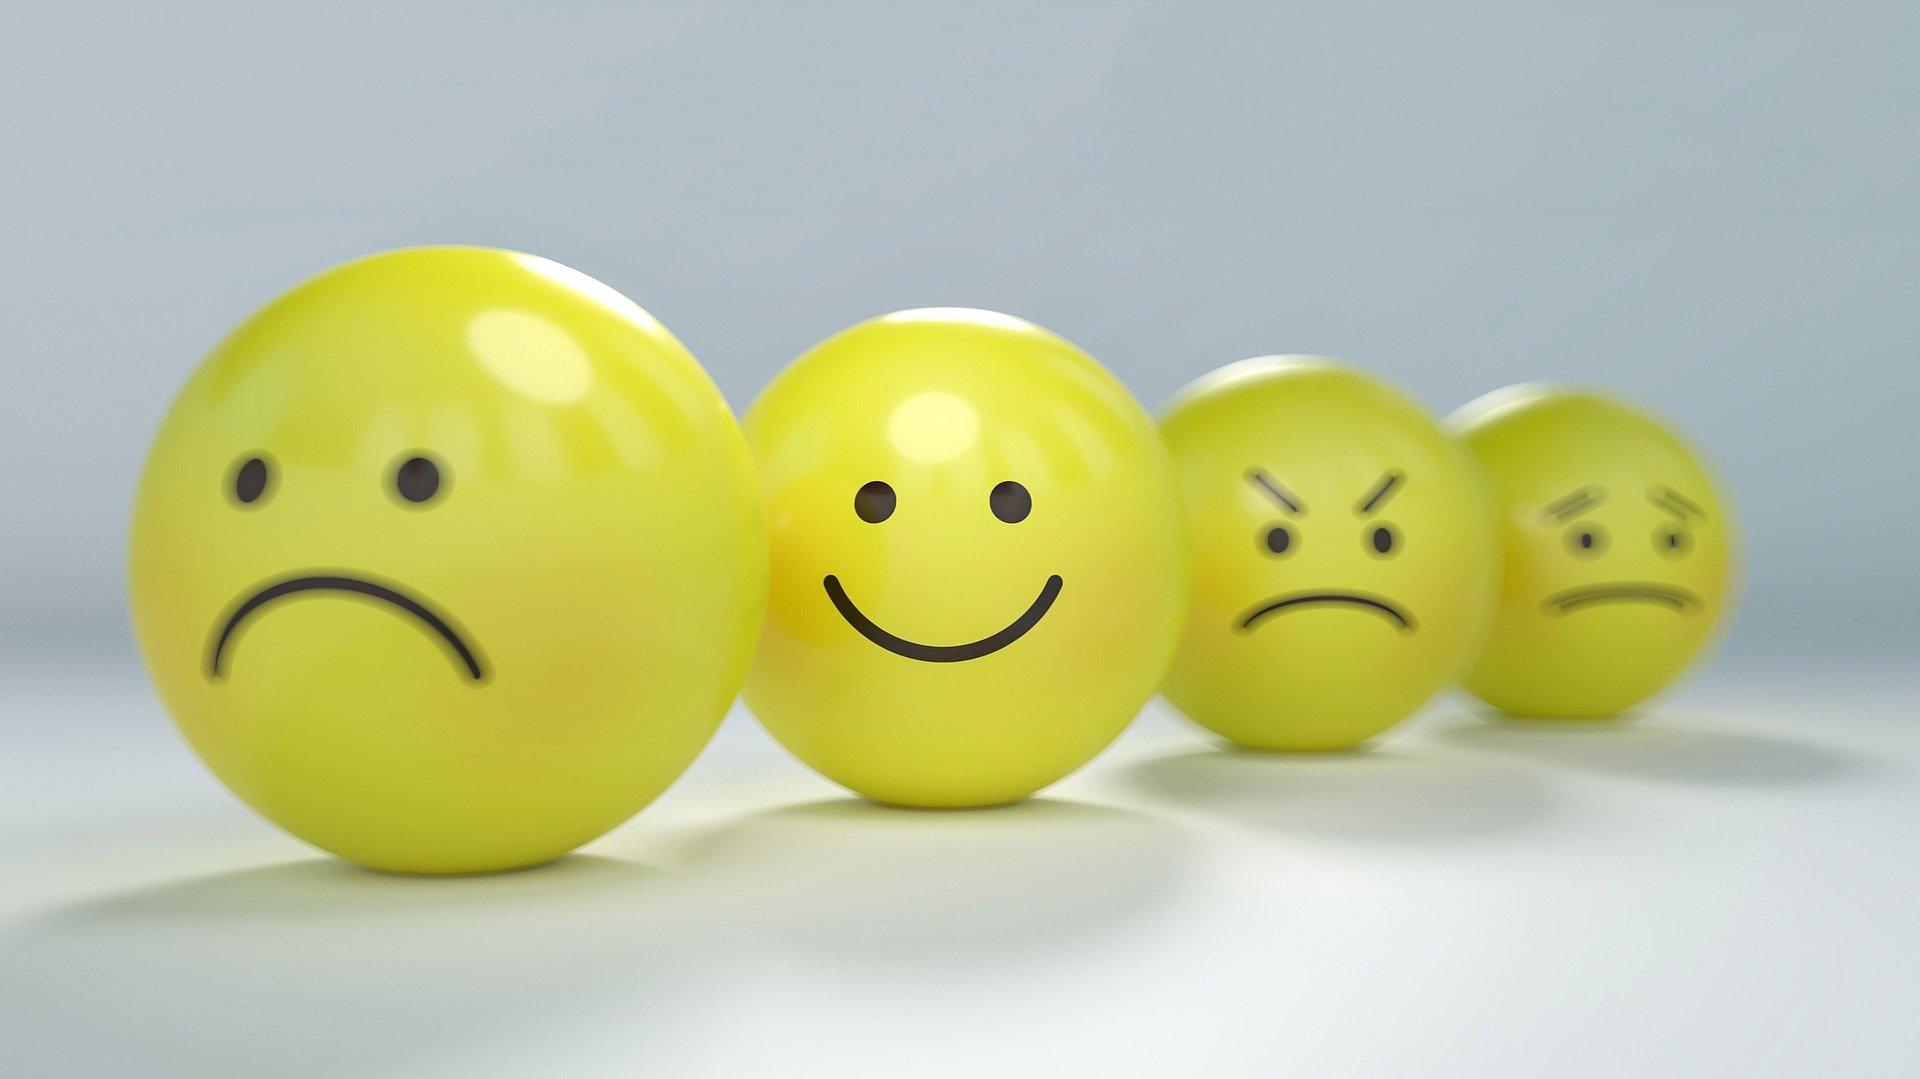 Ineffective Group Management